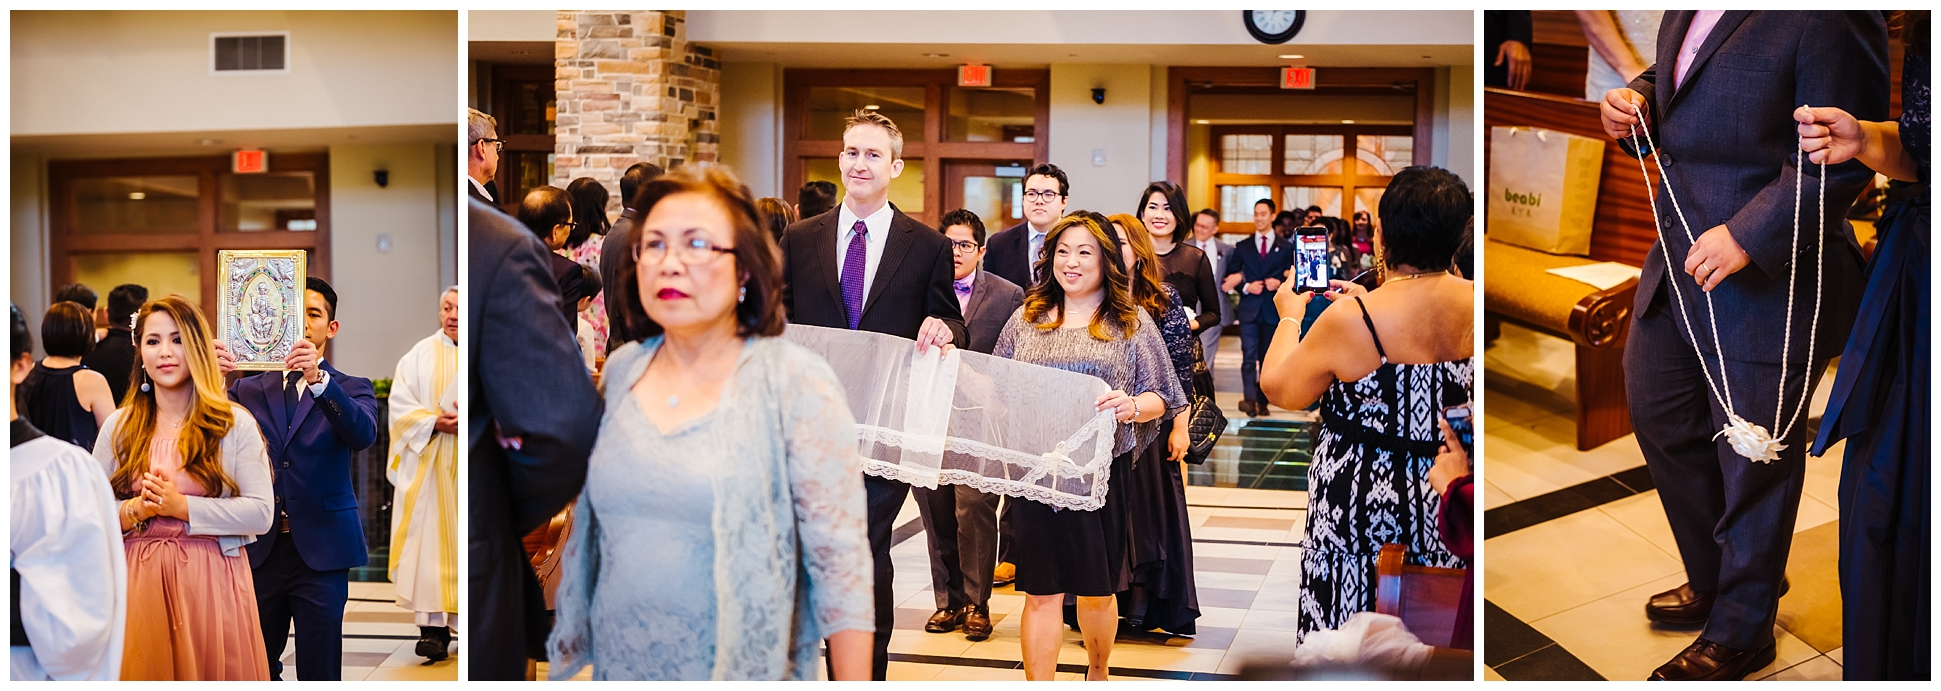 tampa-wedding-photographer-philipino-colorful-woods-ballroom-church-mass-confetti-fuscia_0026.jpg